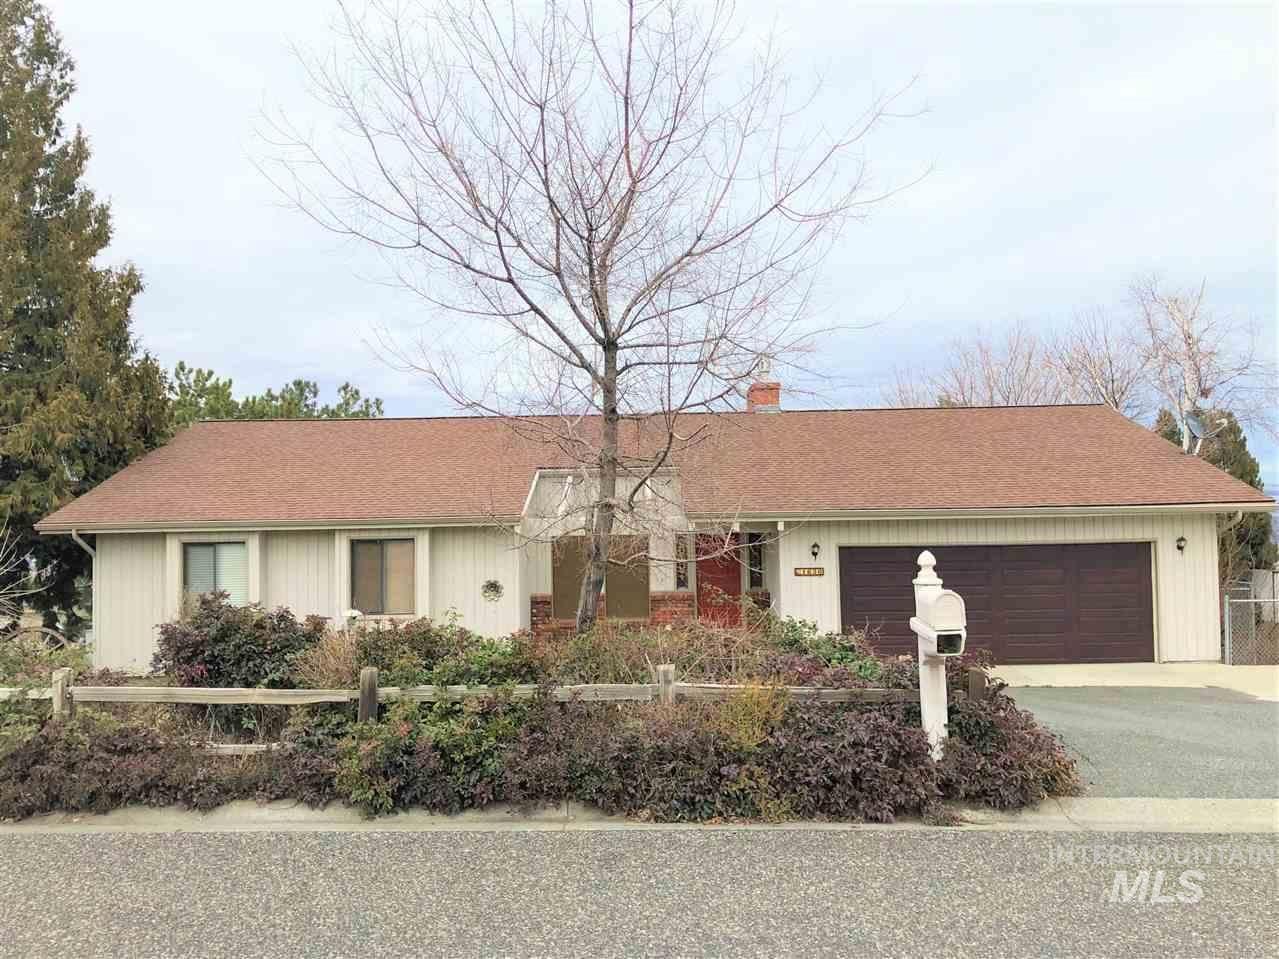 1630 Ridgeview Dr, Clarkston, WA 99403 - MLS#: 98759029